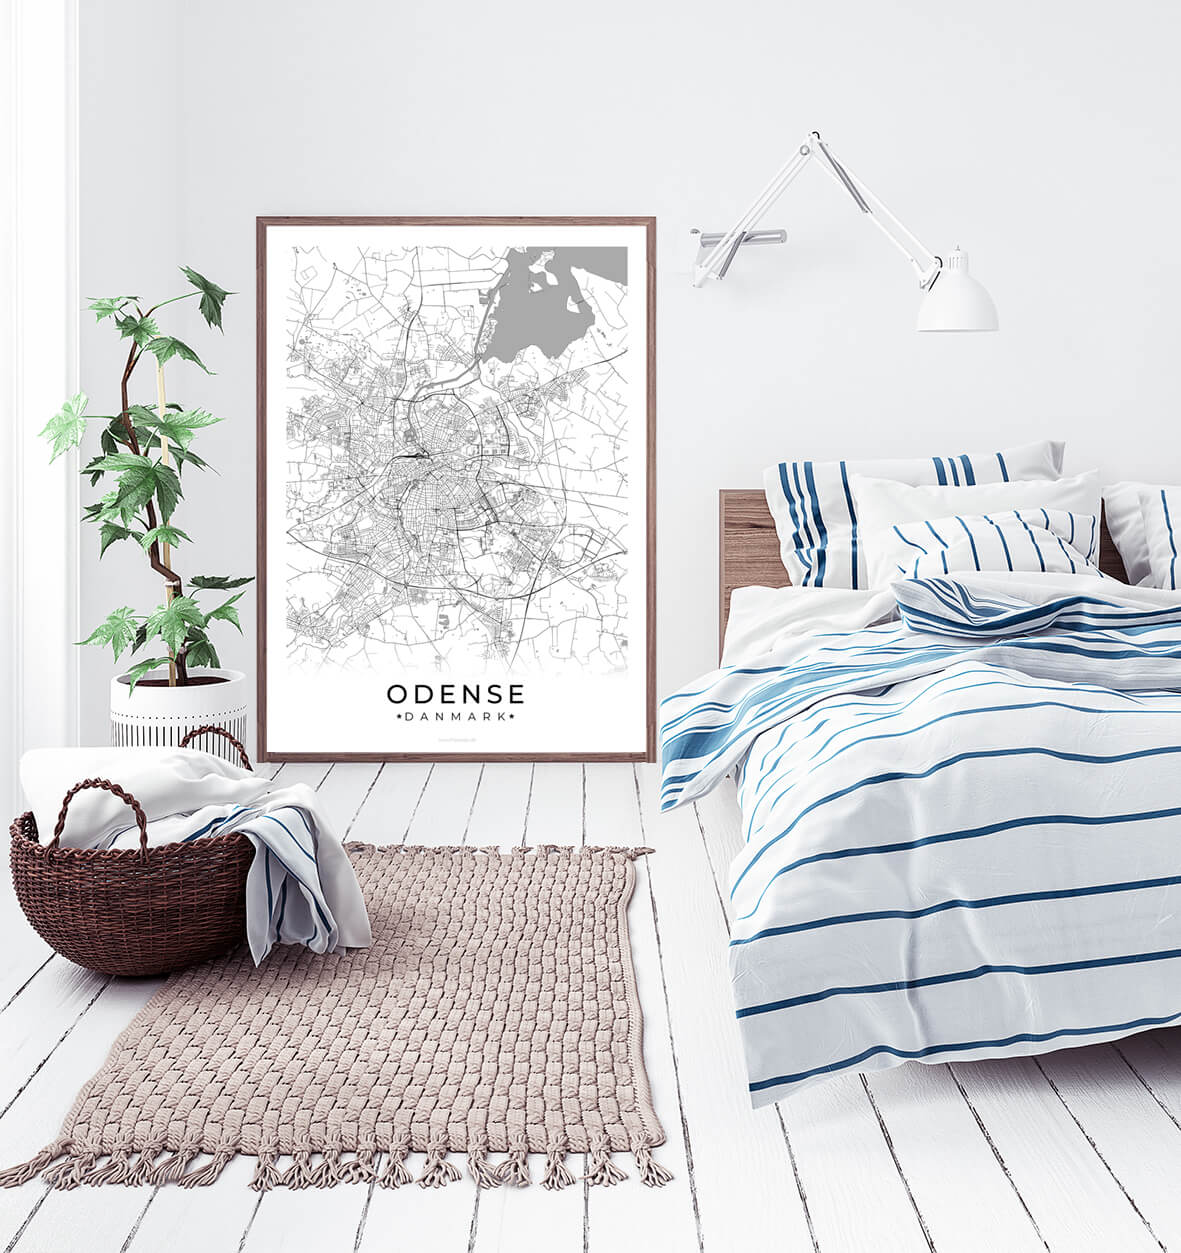 Odense-hvid-byplakat-2